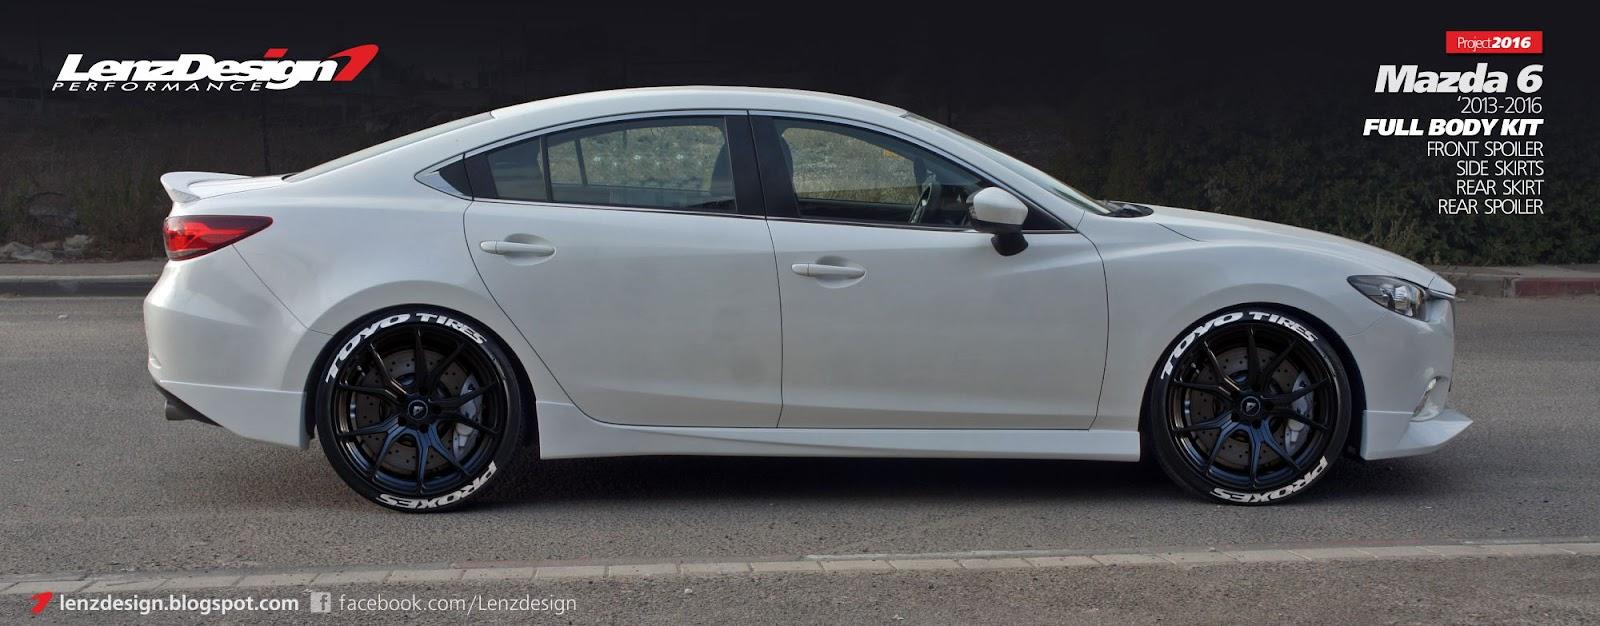 Mazda 6 Gj Atenza Tuning Amp Body Kit Lenzdesign Performance